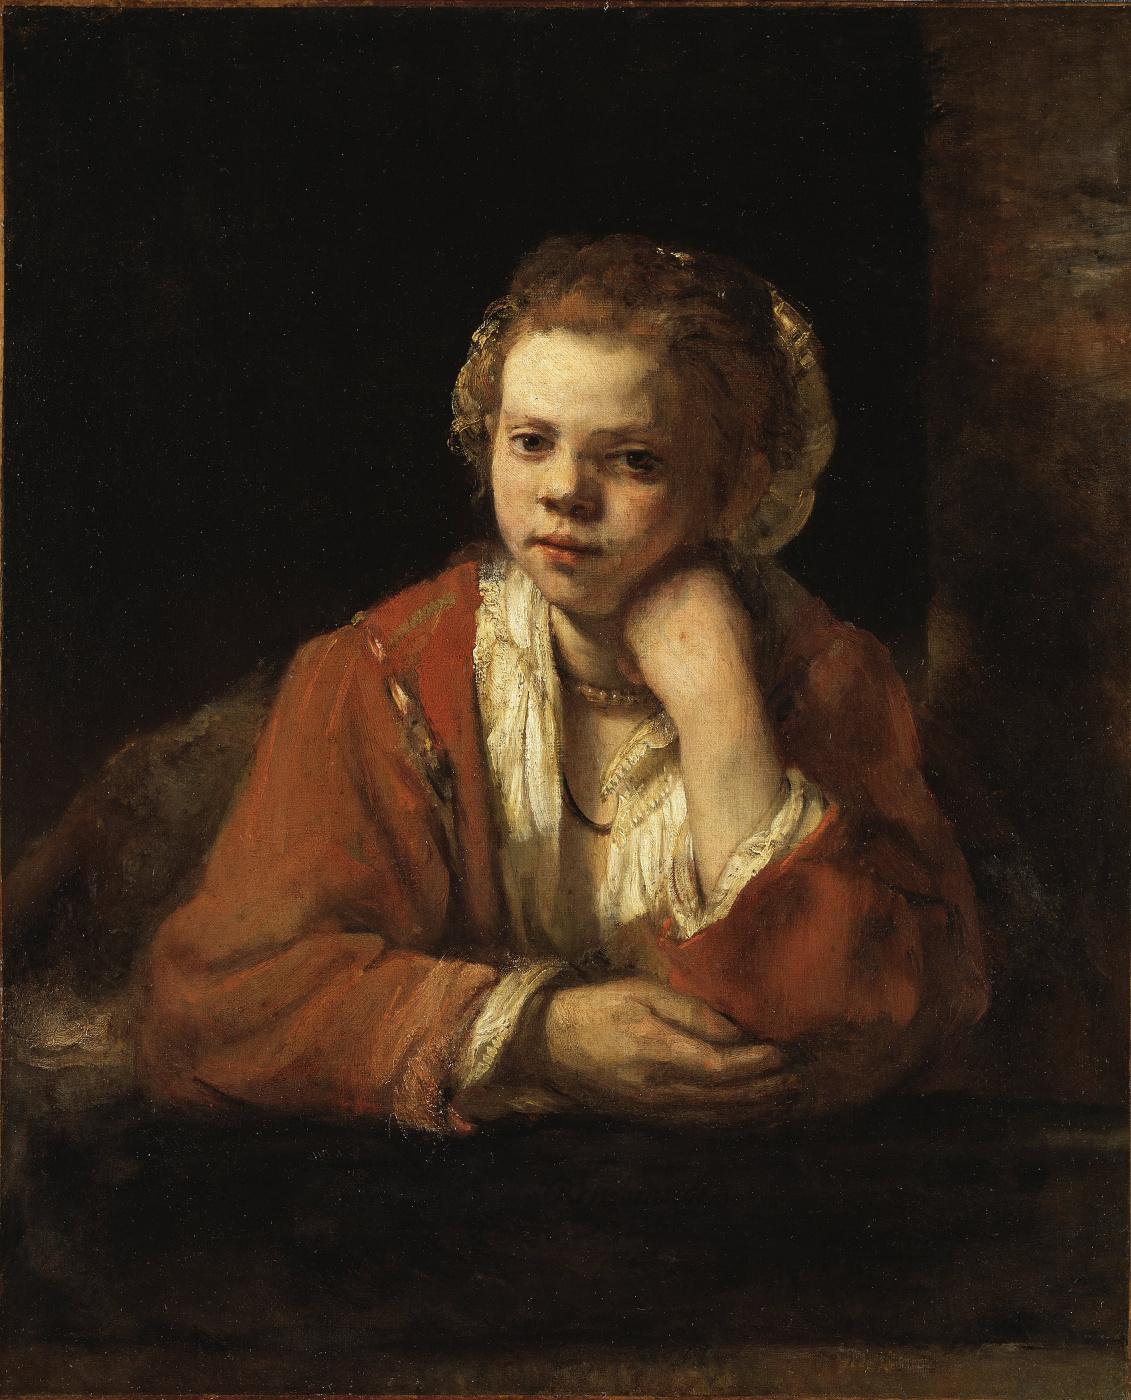 Rembrandt Harmenszoon van Rijn. Cook